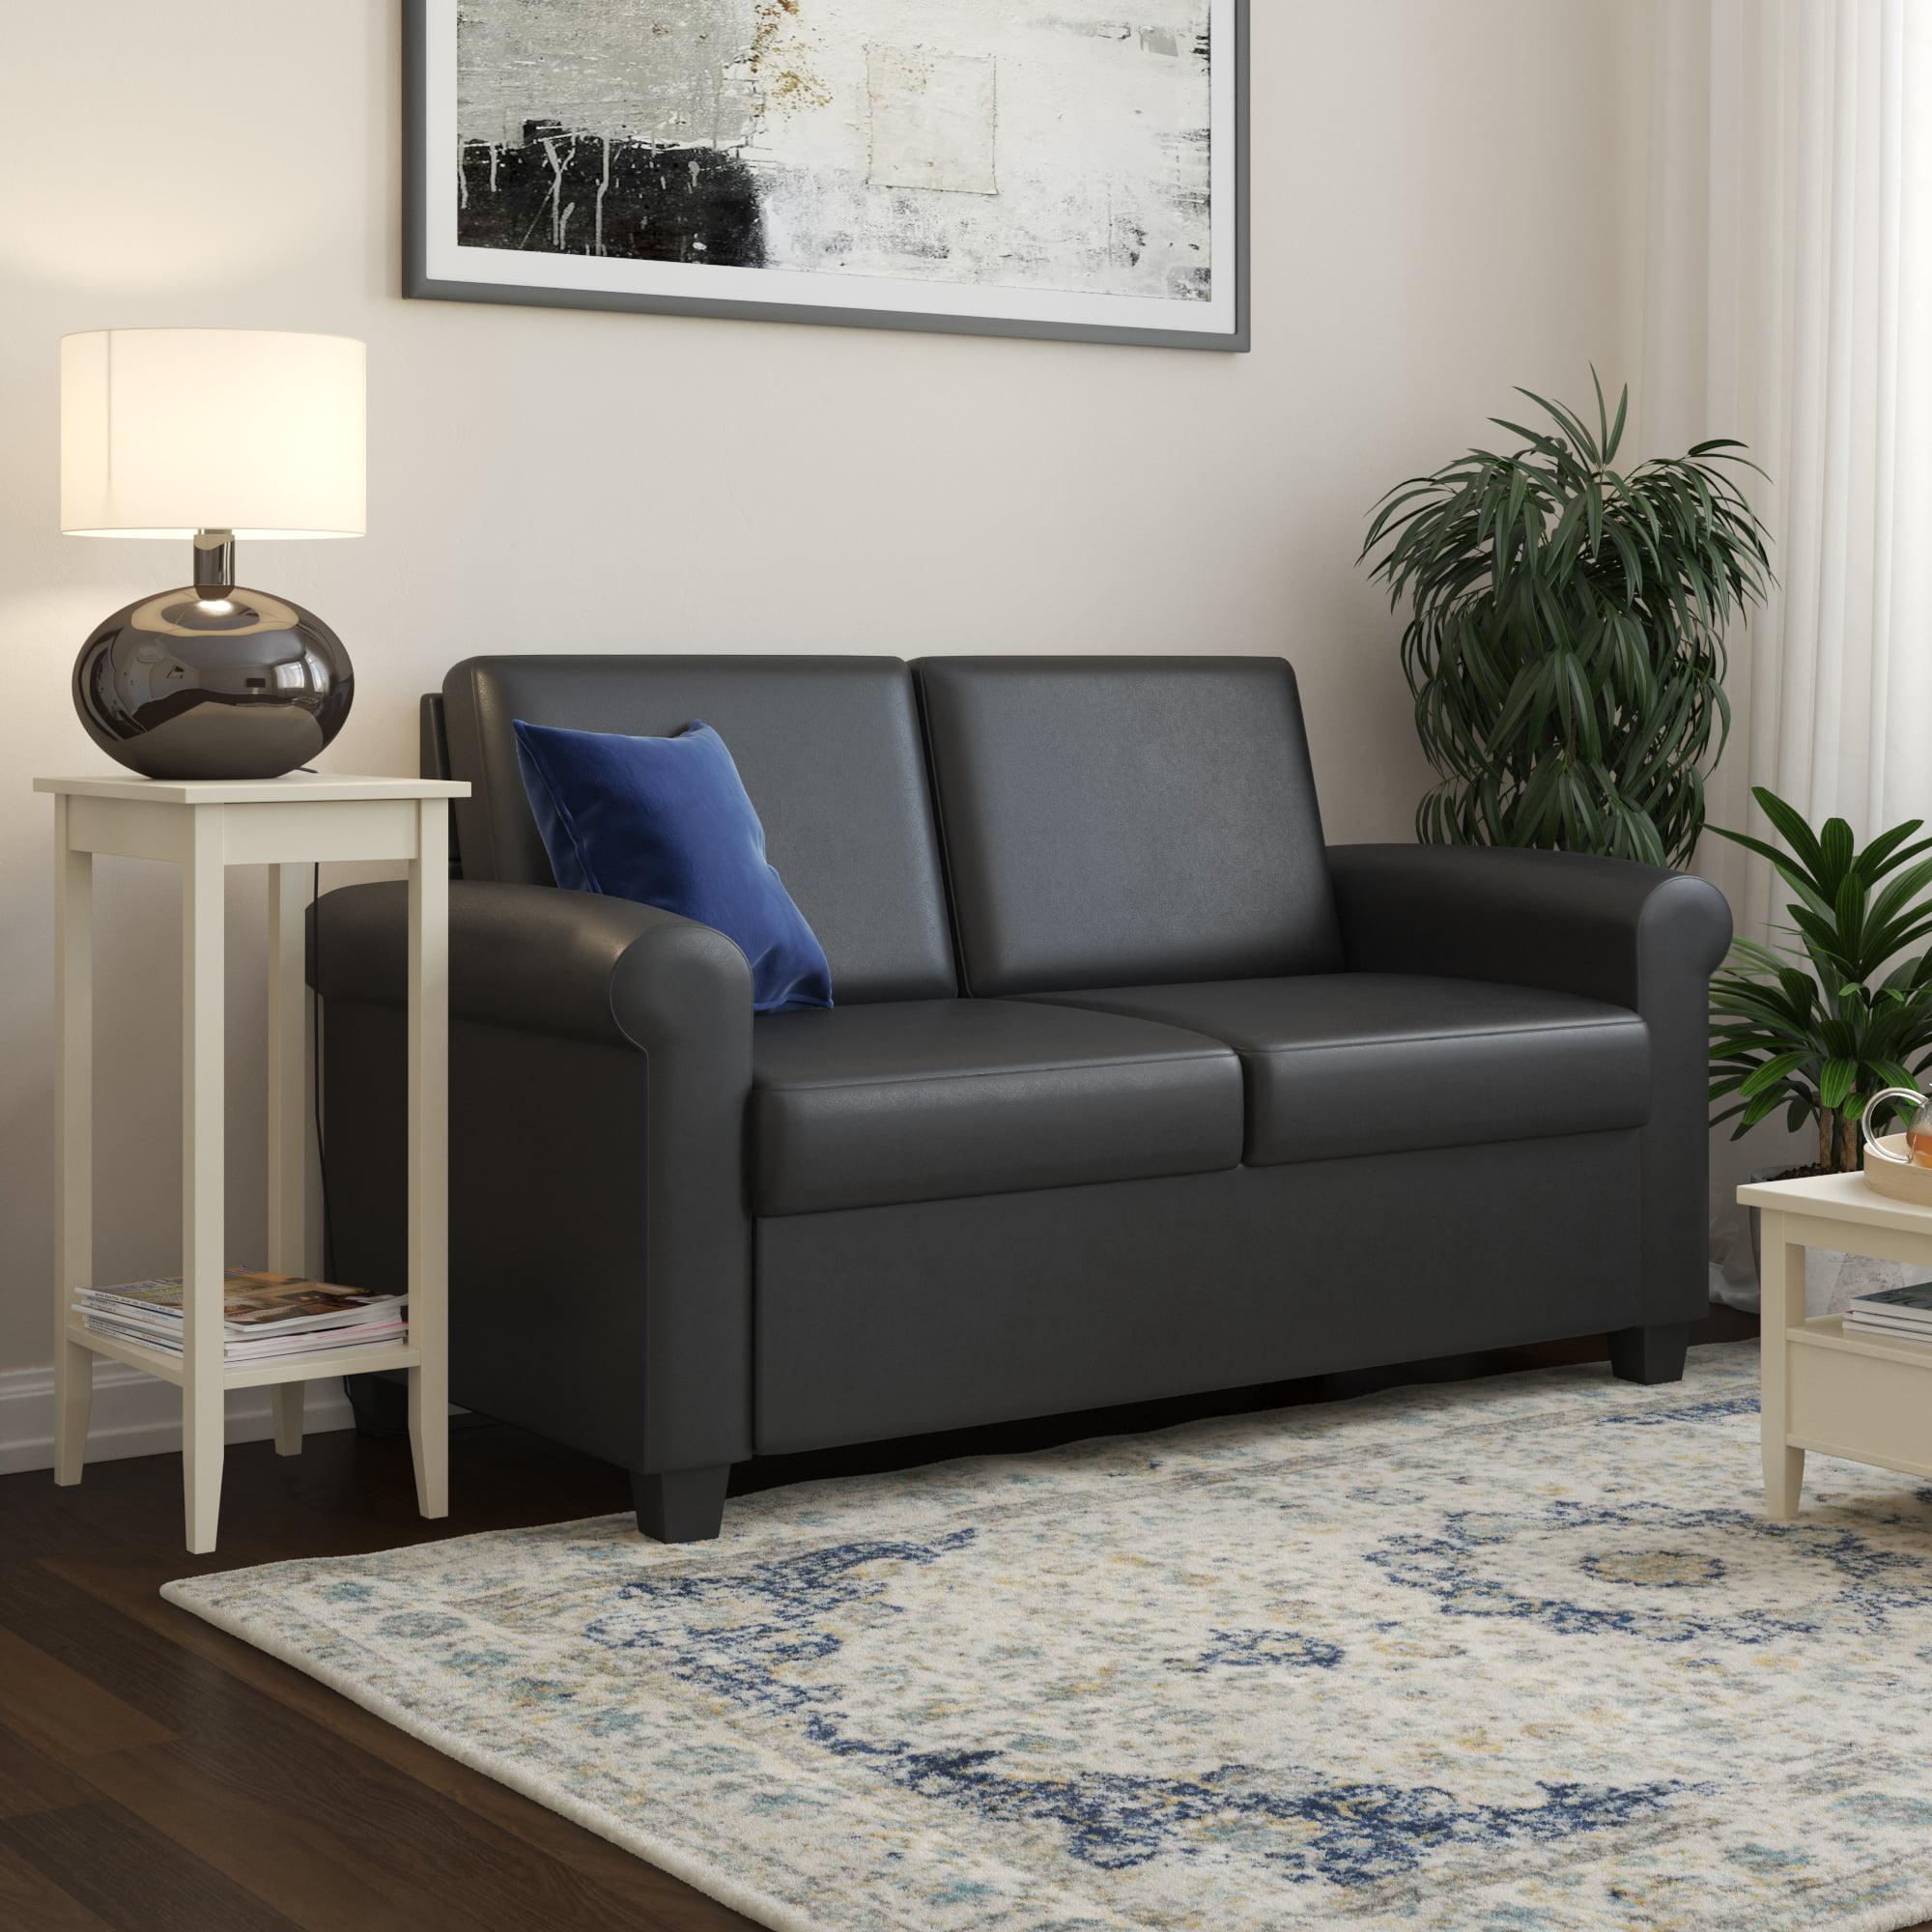 Dhp logan twin sleeper sofa black faux leather walmart com